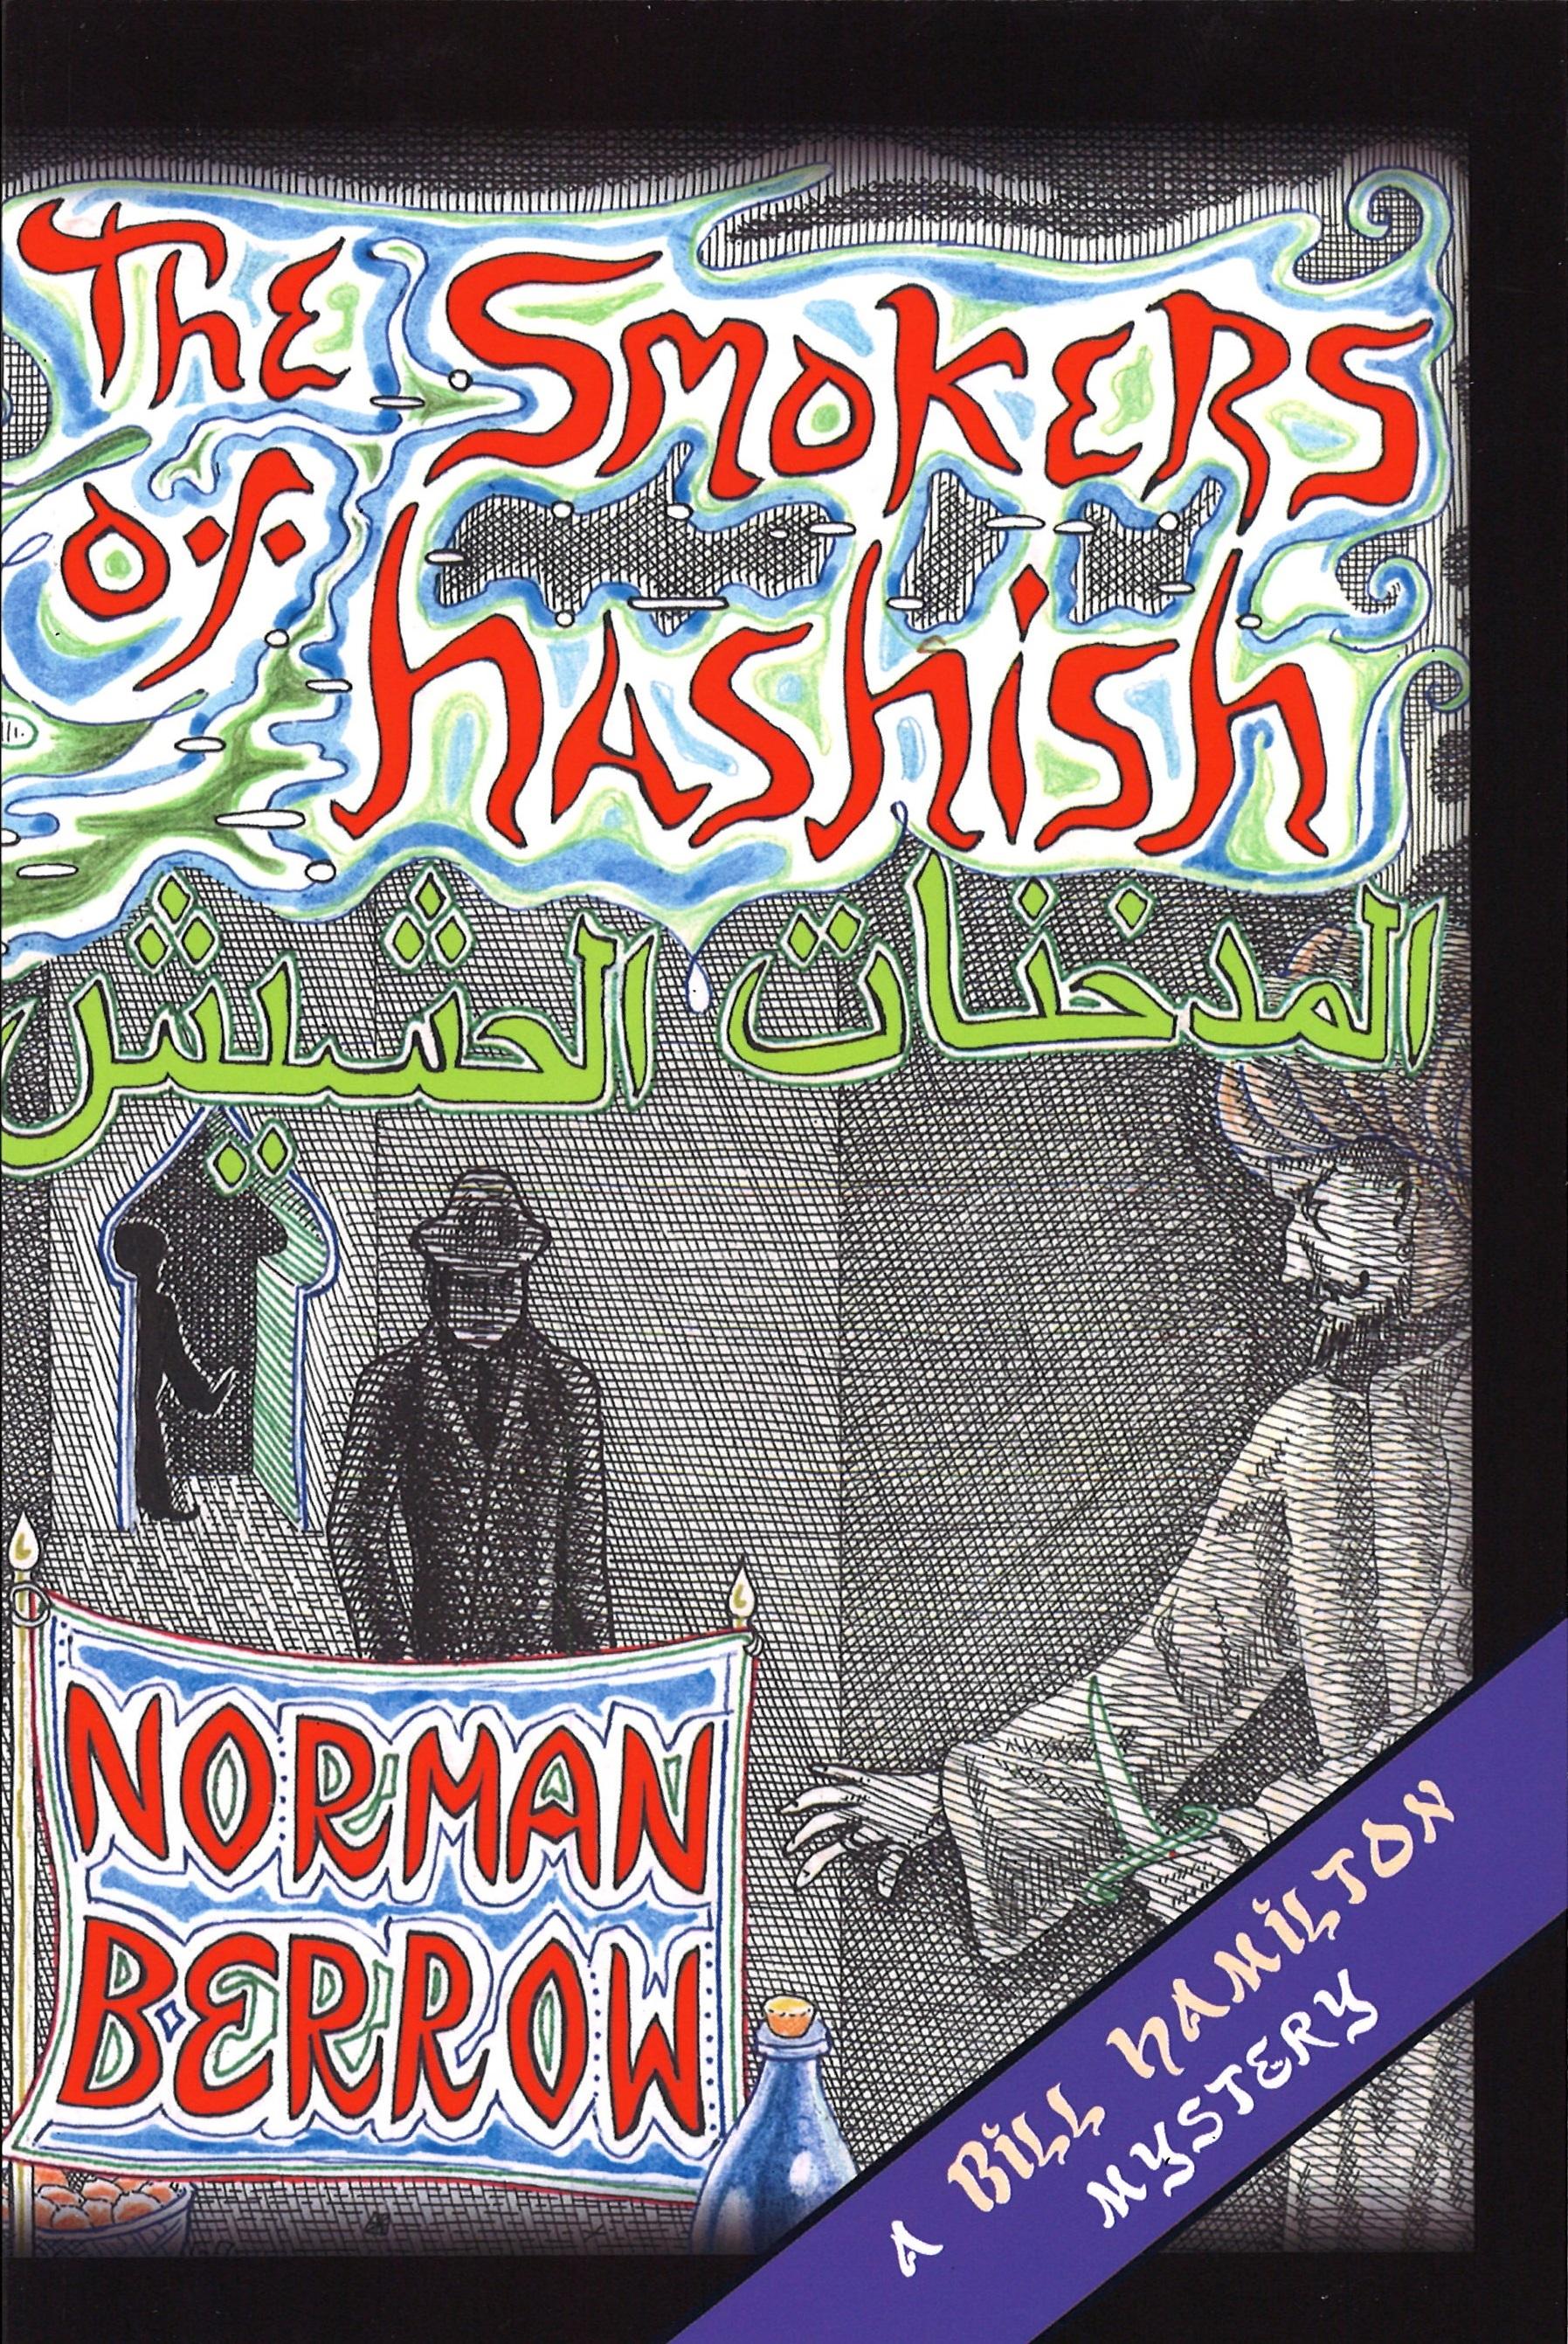 Smokers of Hashish